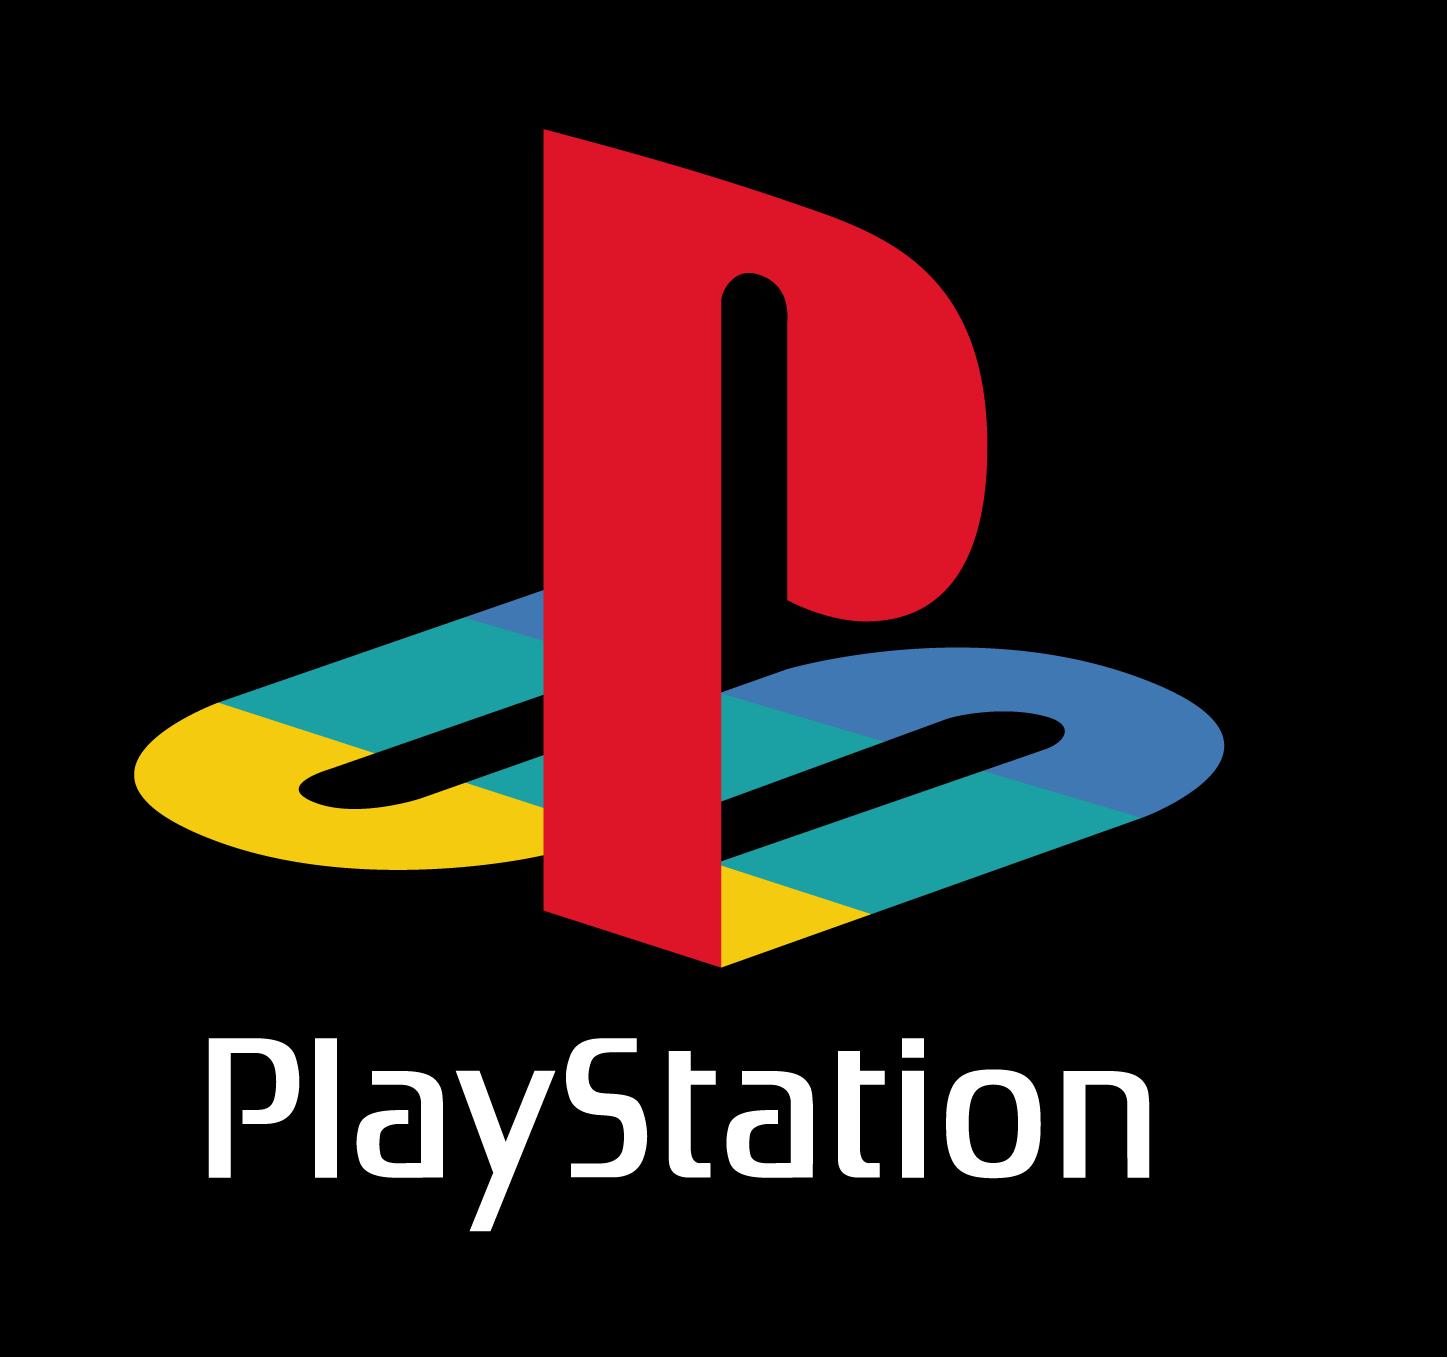 Best Gaming Company Logos